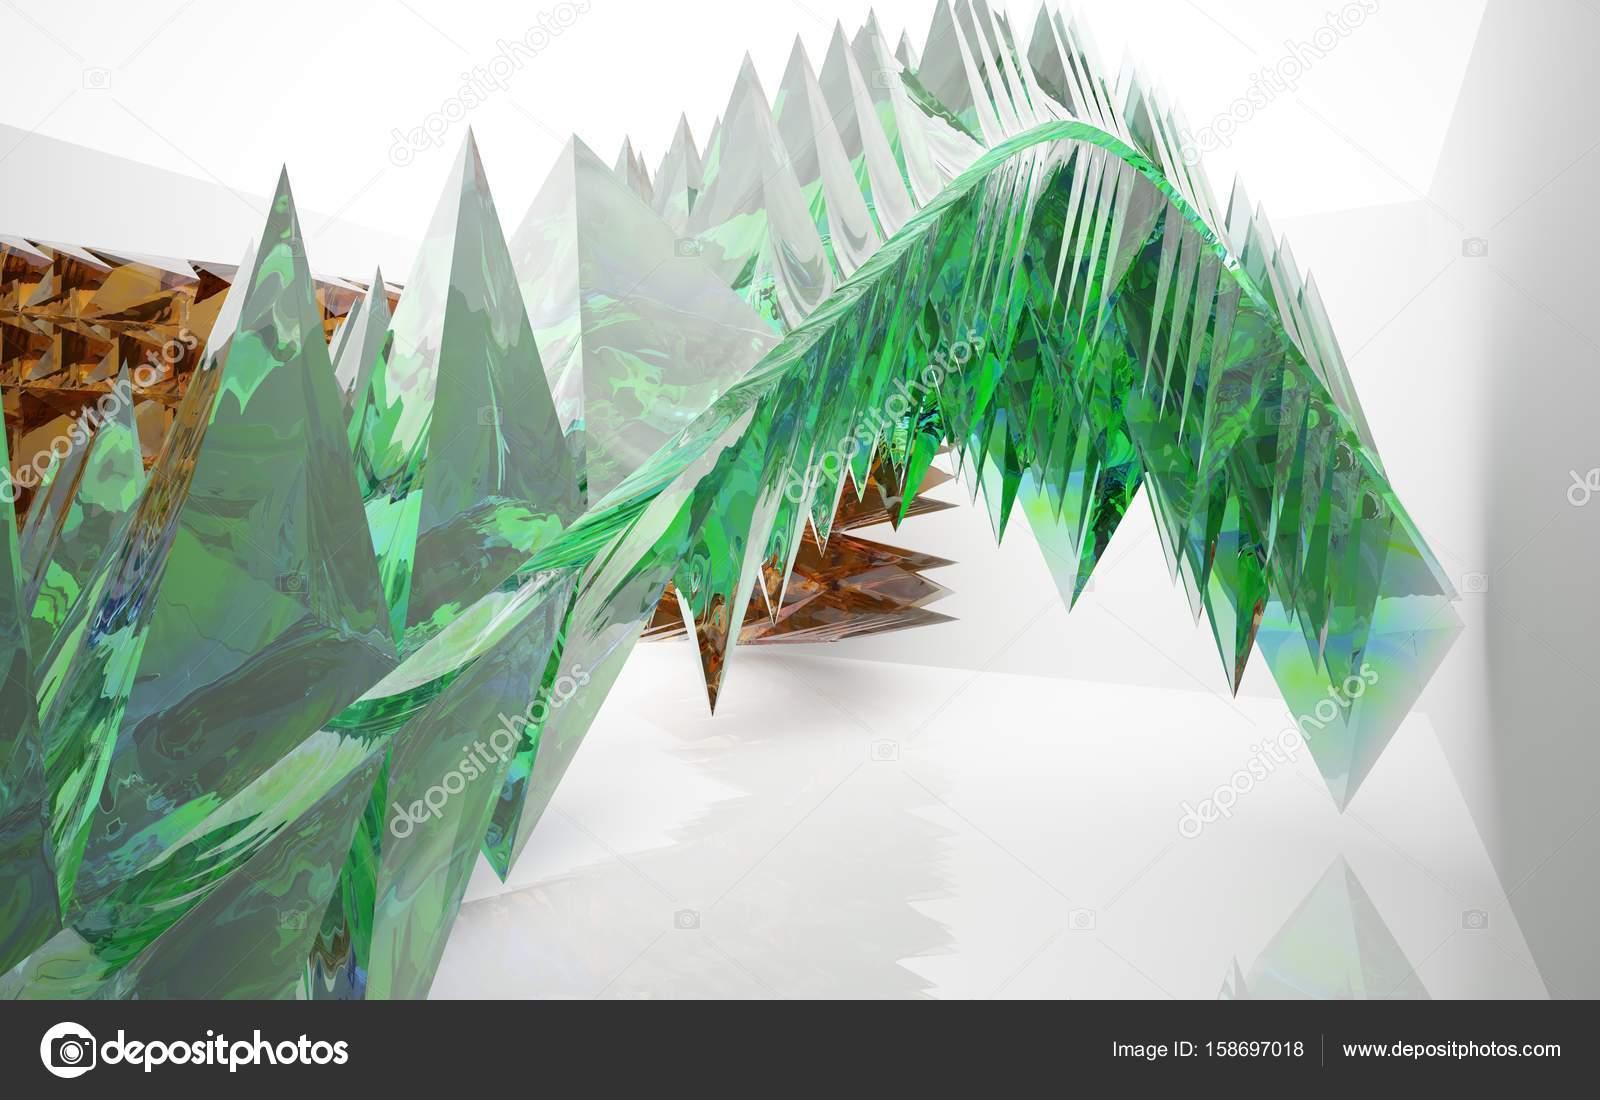 Minimalistische interieur met gekleurde glazen kristallen